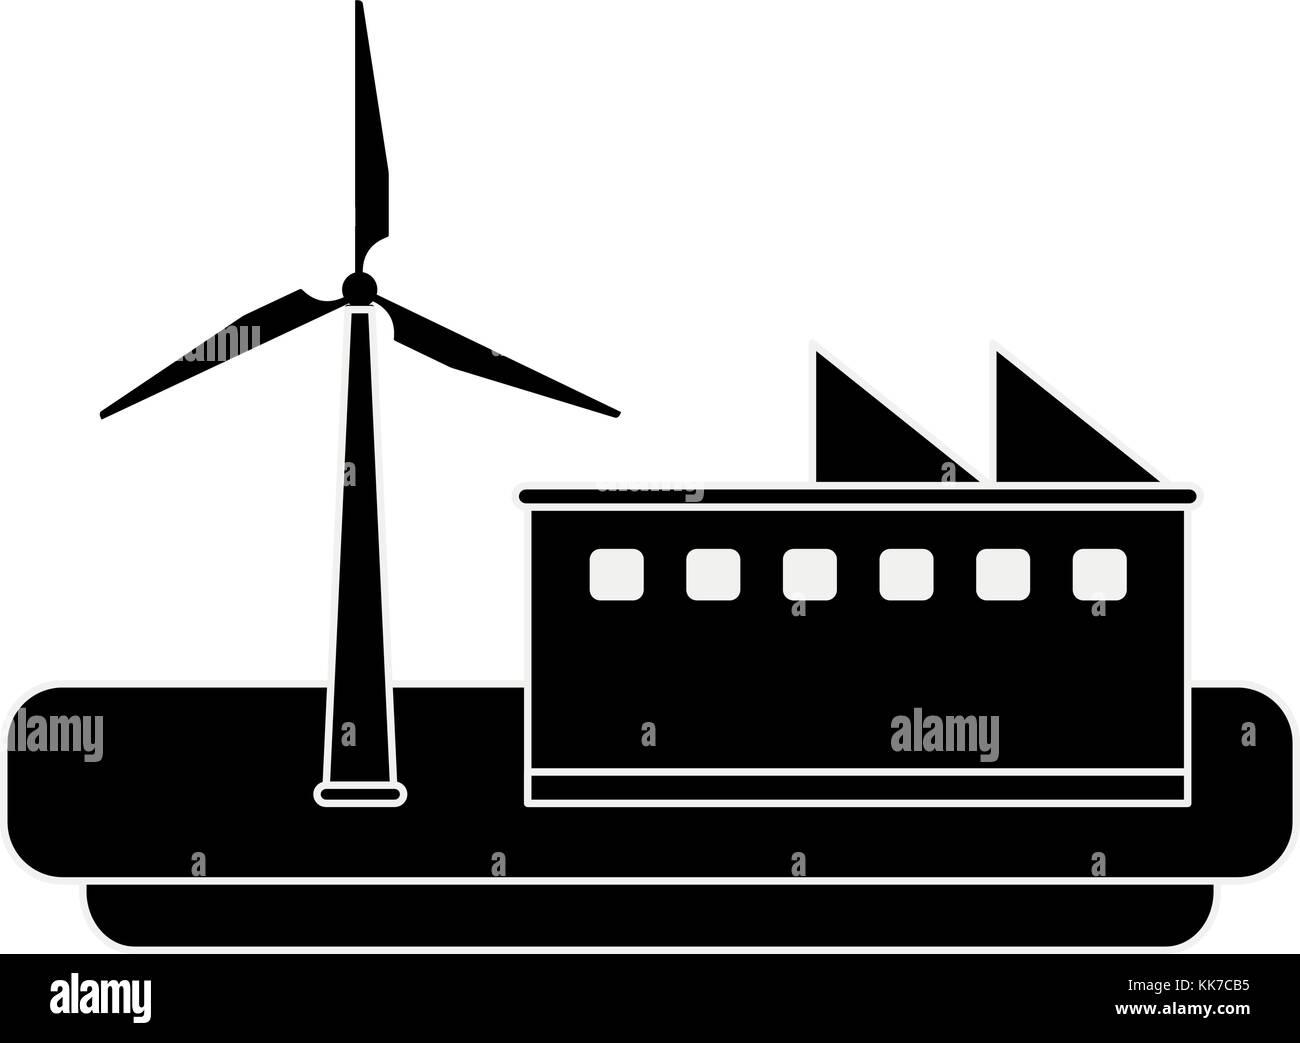 Solar panels energy - Stock Image